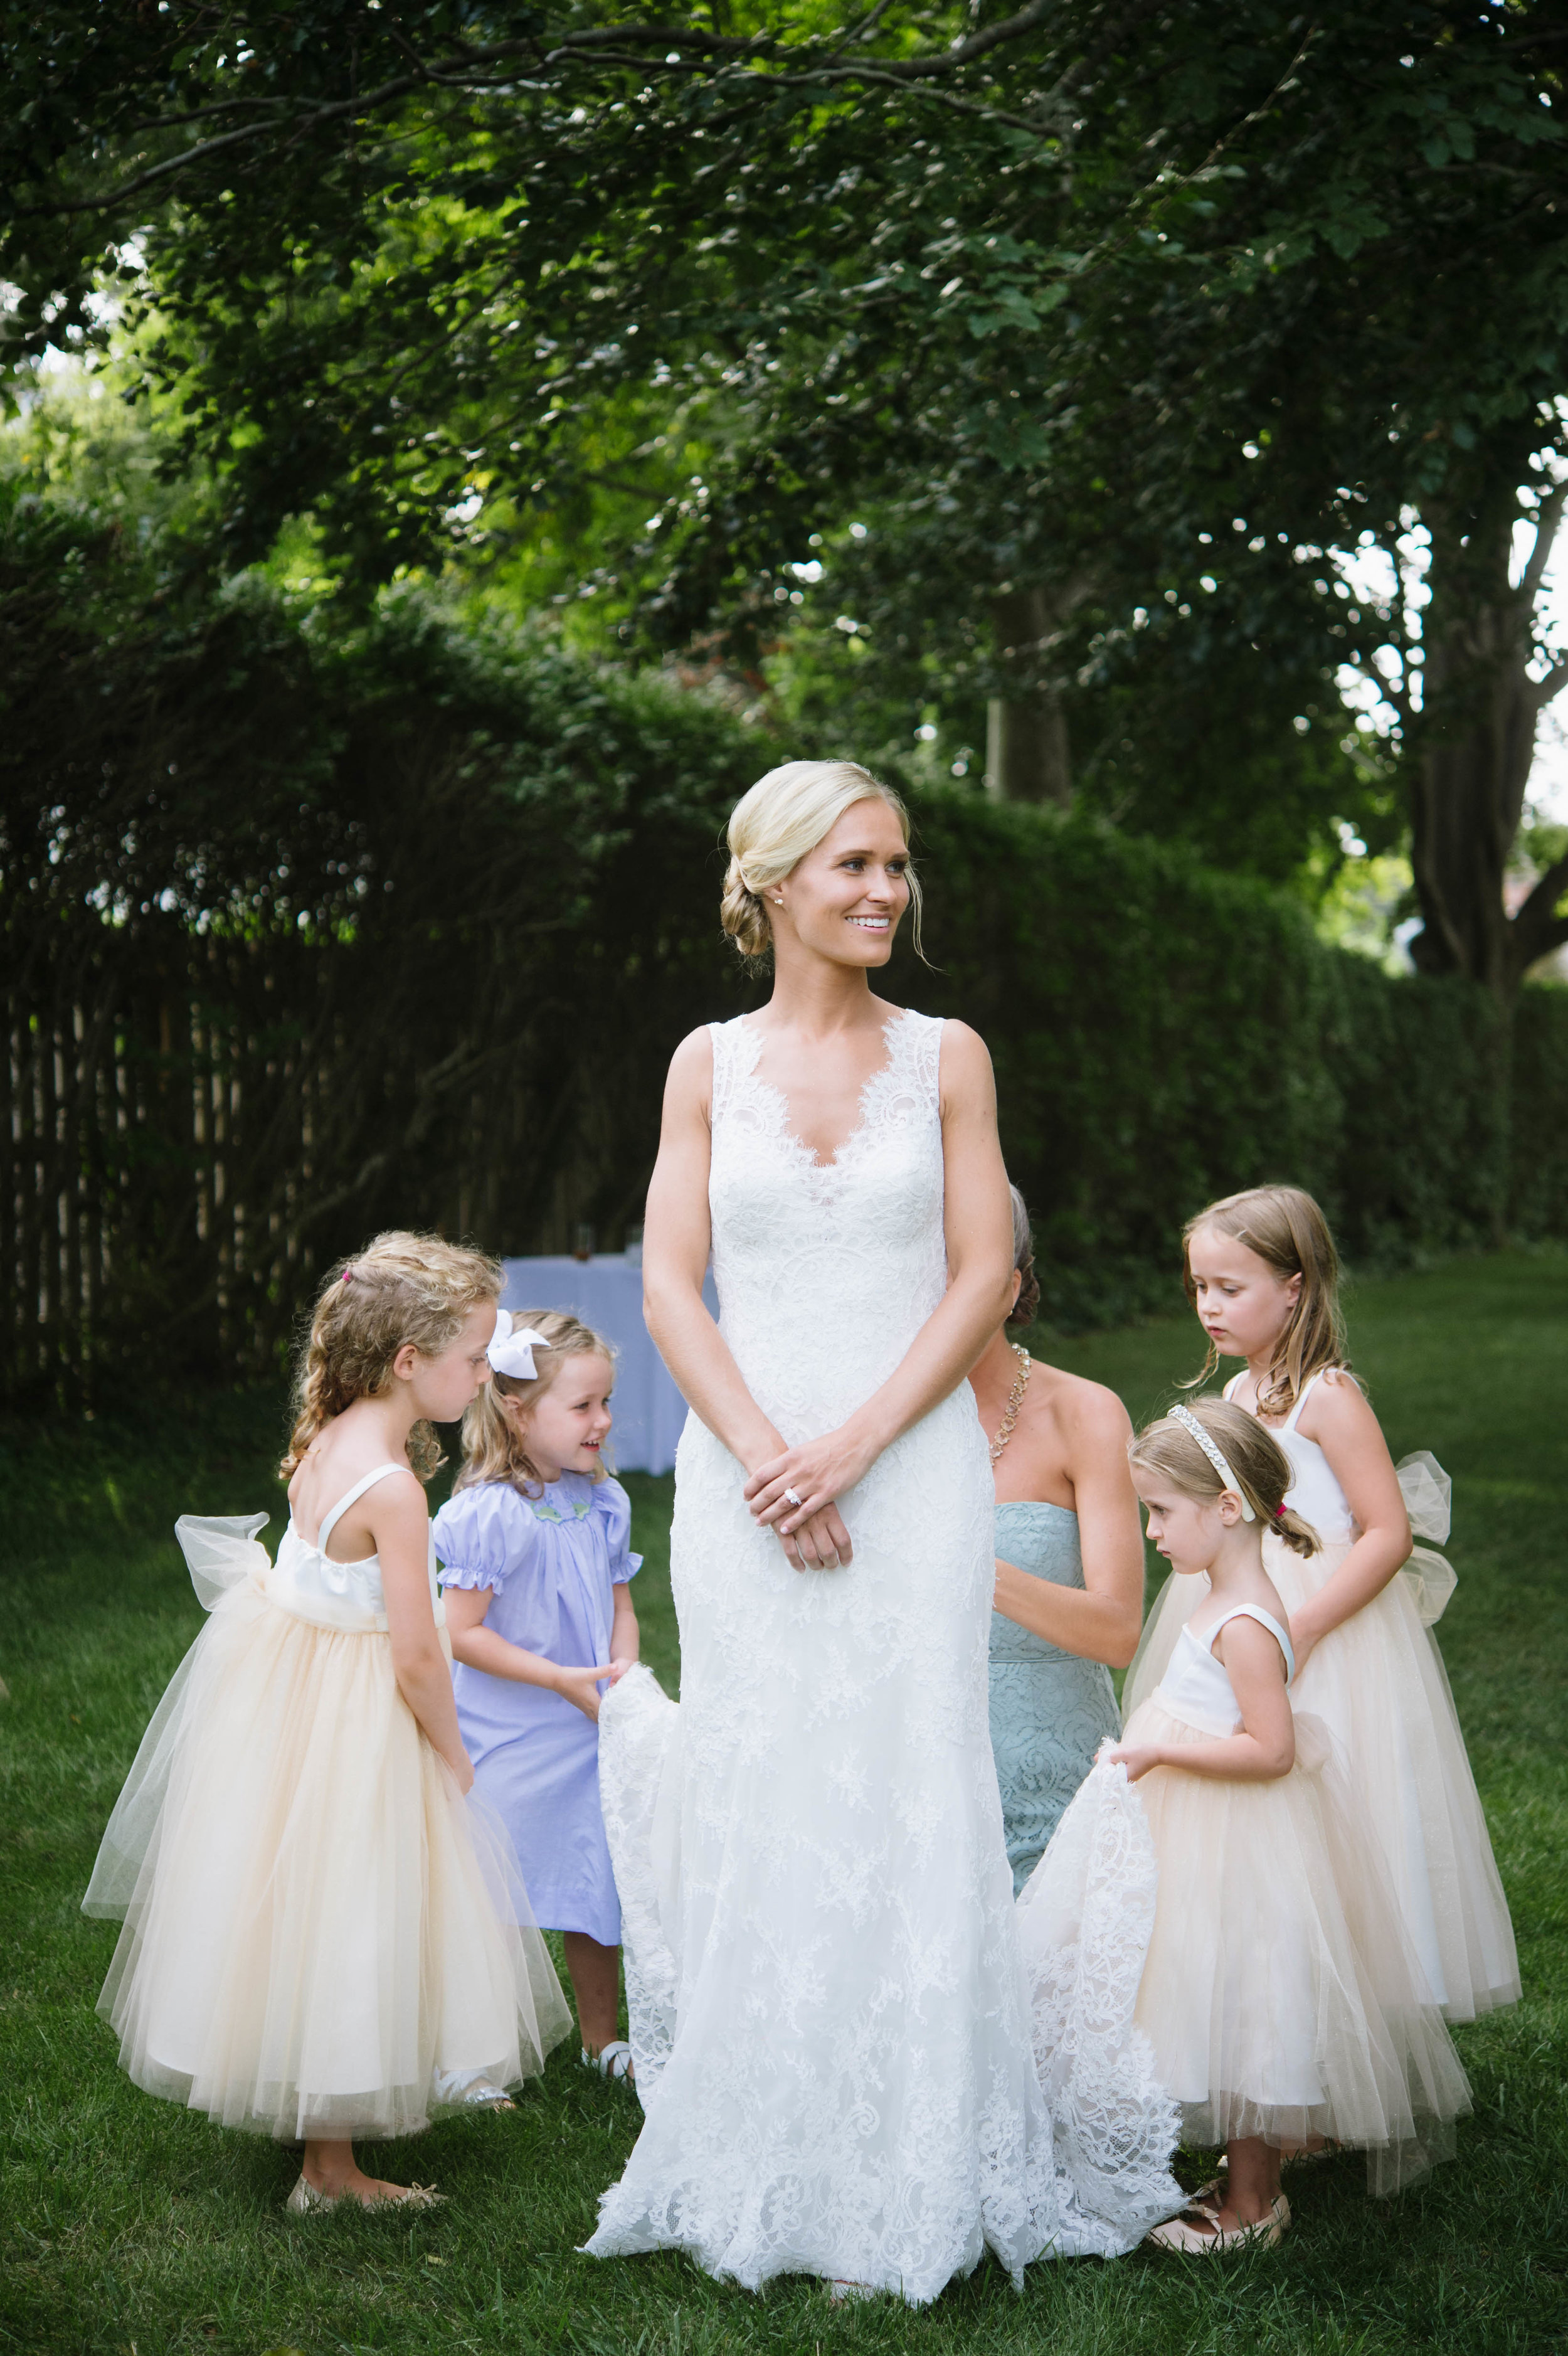 Candid-Wedding-Photography005.jpg